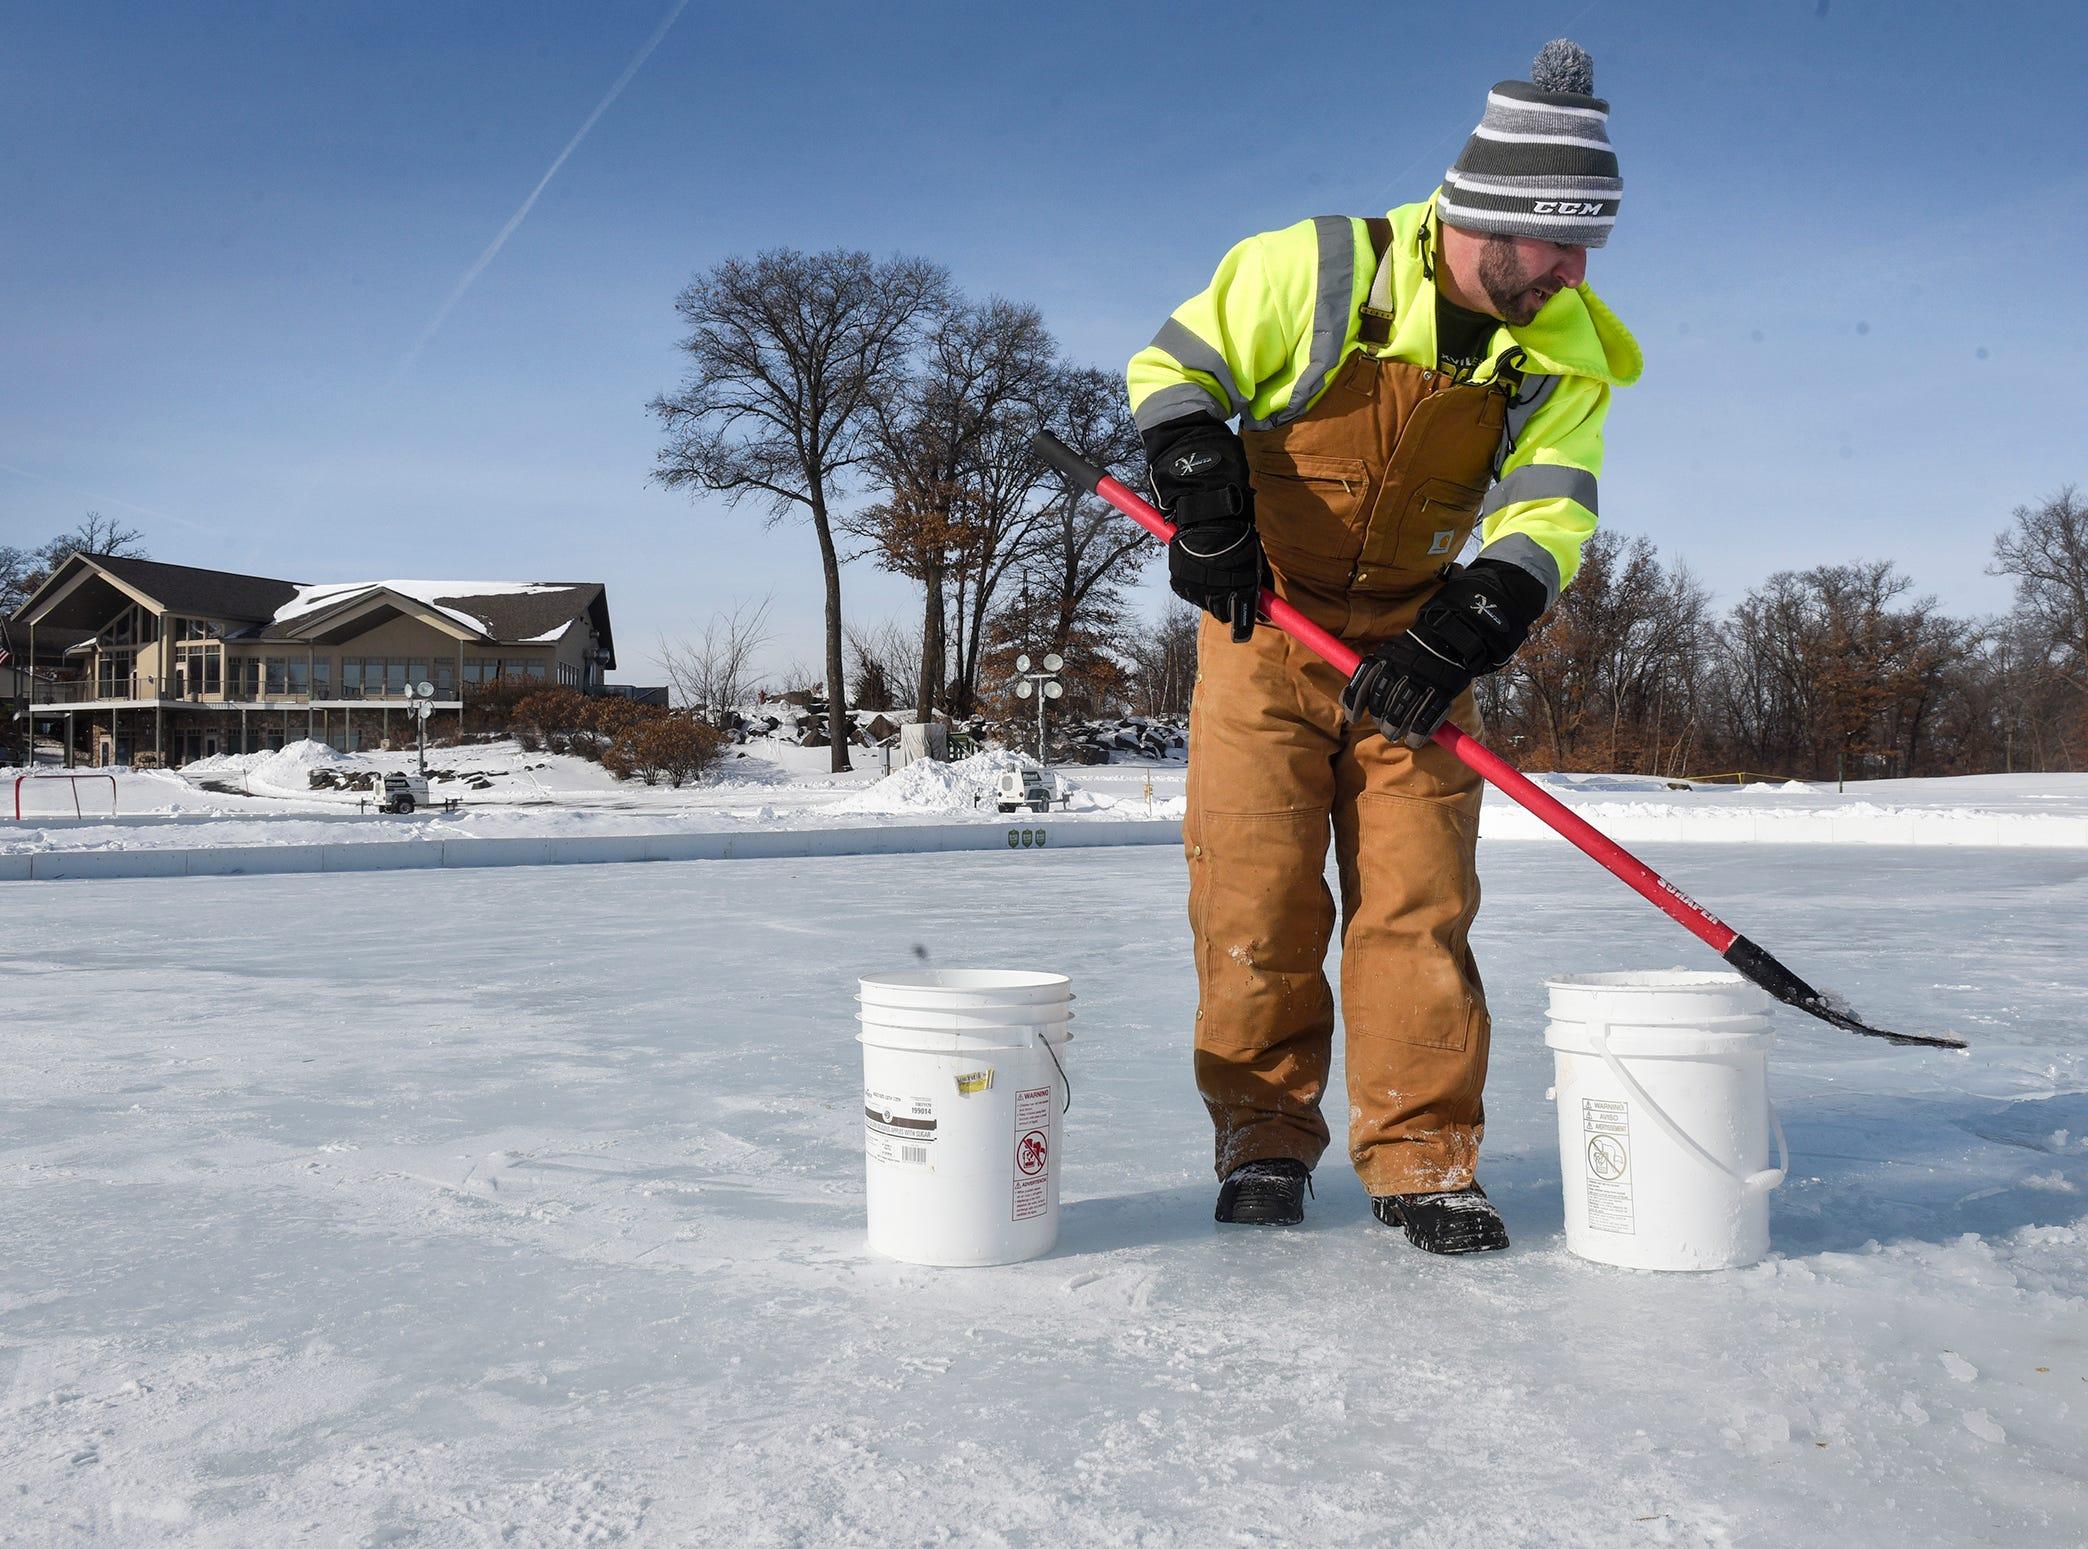 Volunteer Jeremy Koelln prepares one of three hockey rinks for the Granite City Outdoor Hockey Festival Friday, Feb. 1, at Blackberry Ridge Golf Club in Sartell.